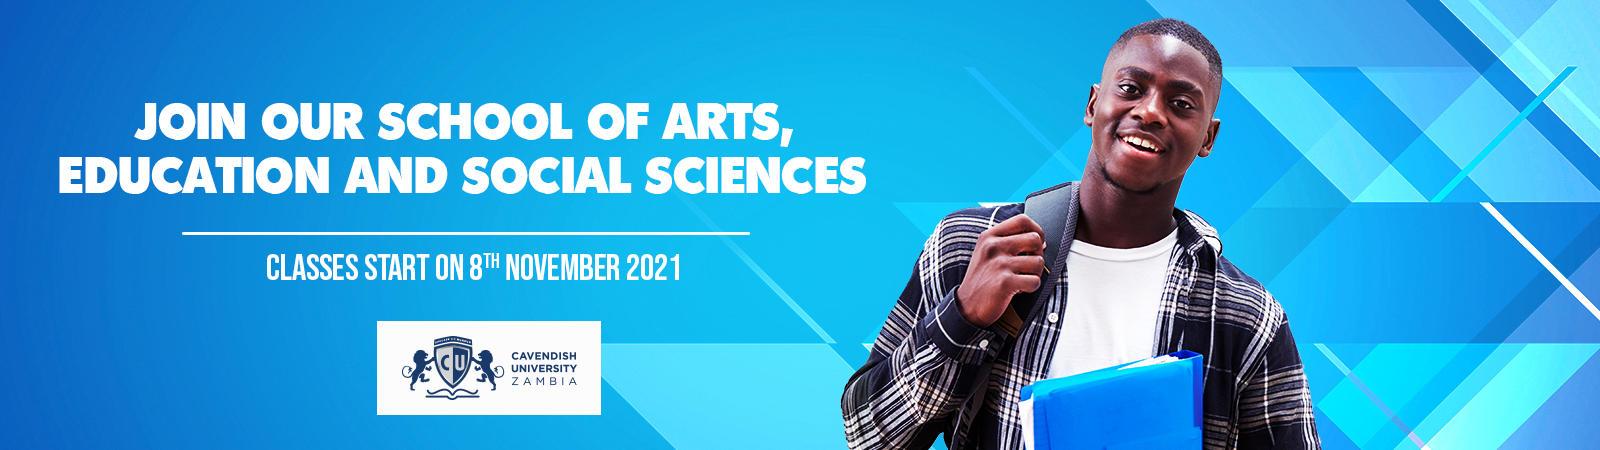 School of Arts, Education and Social Sciences